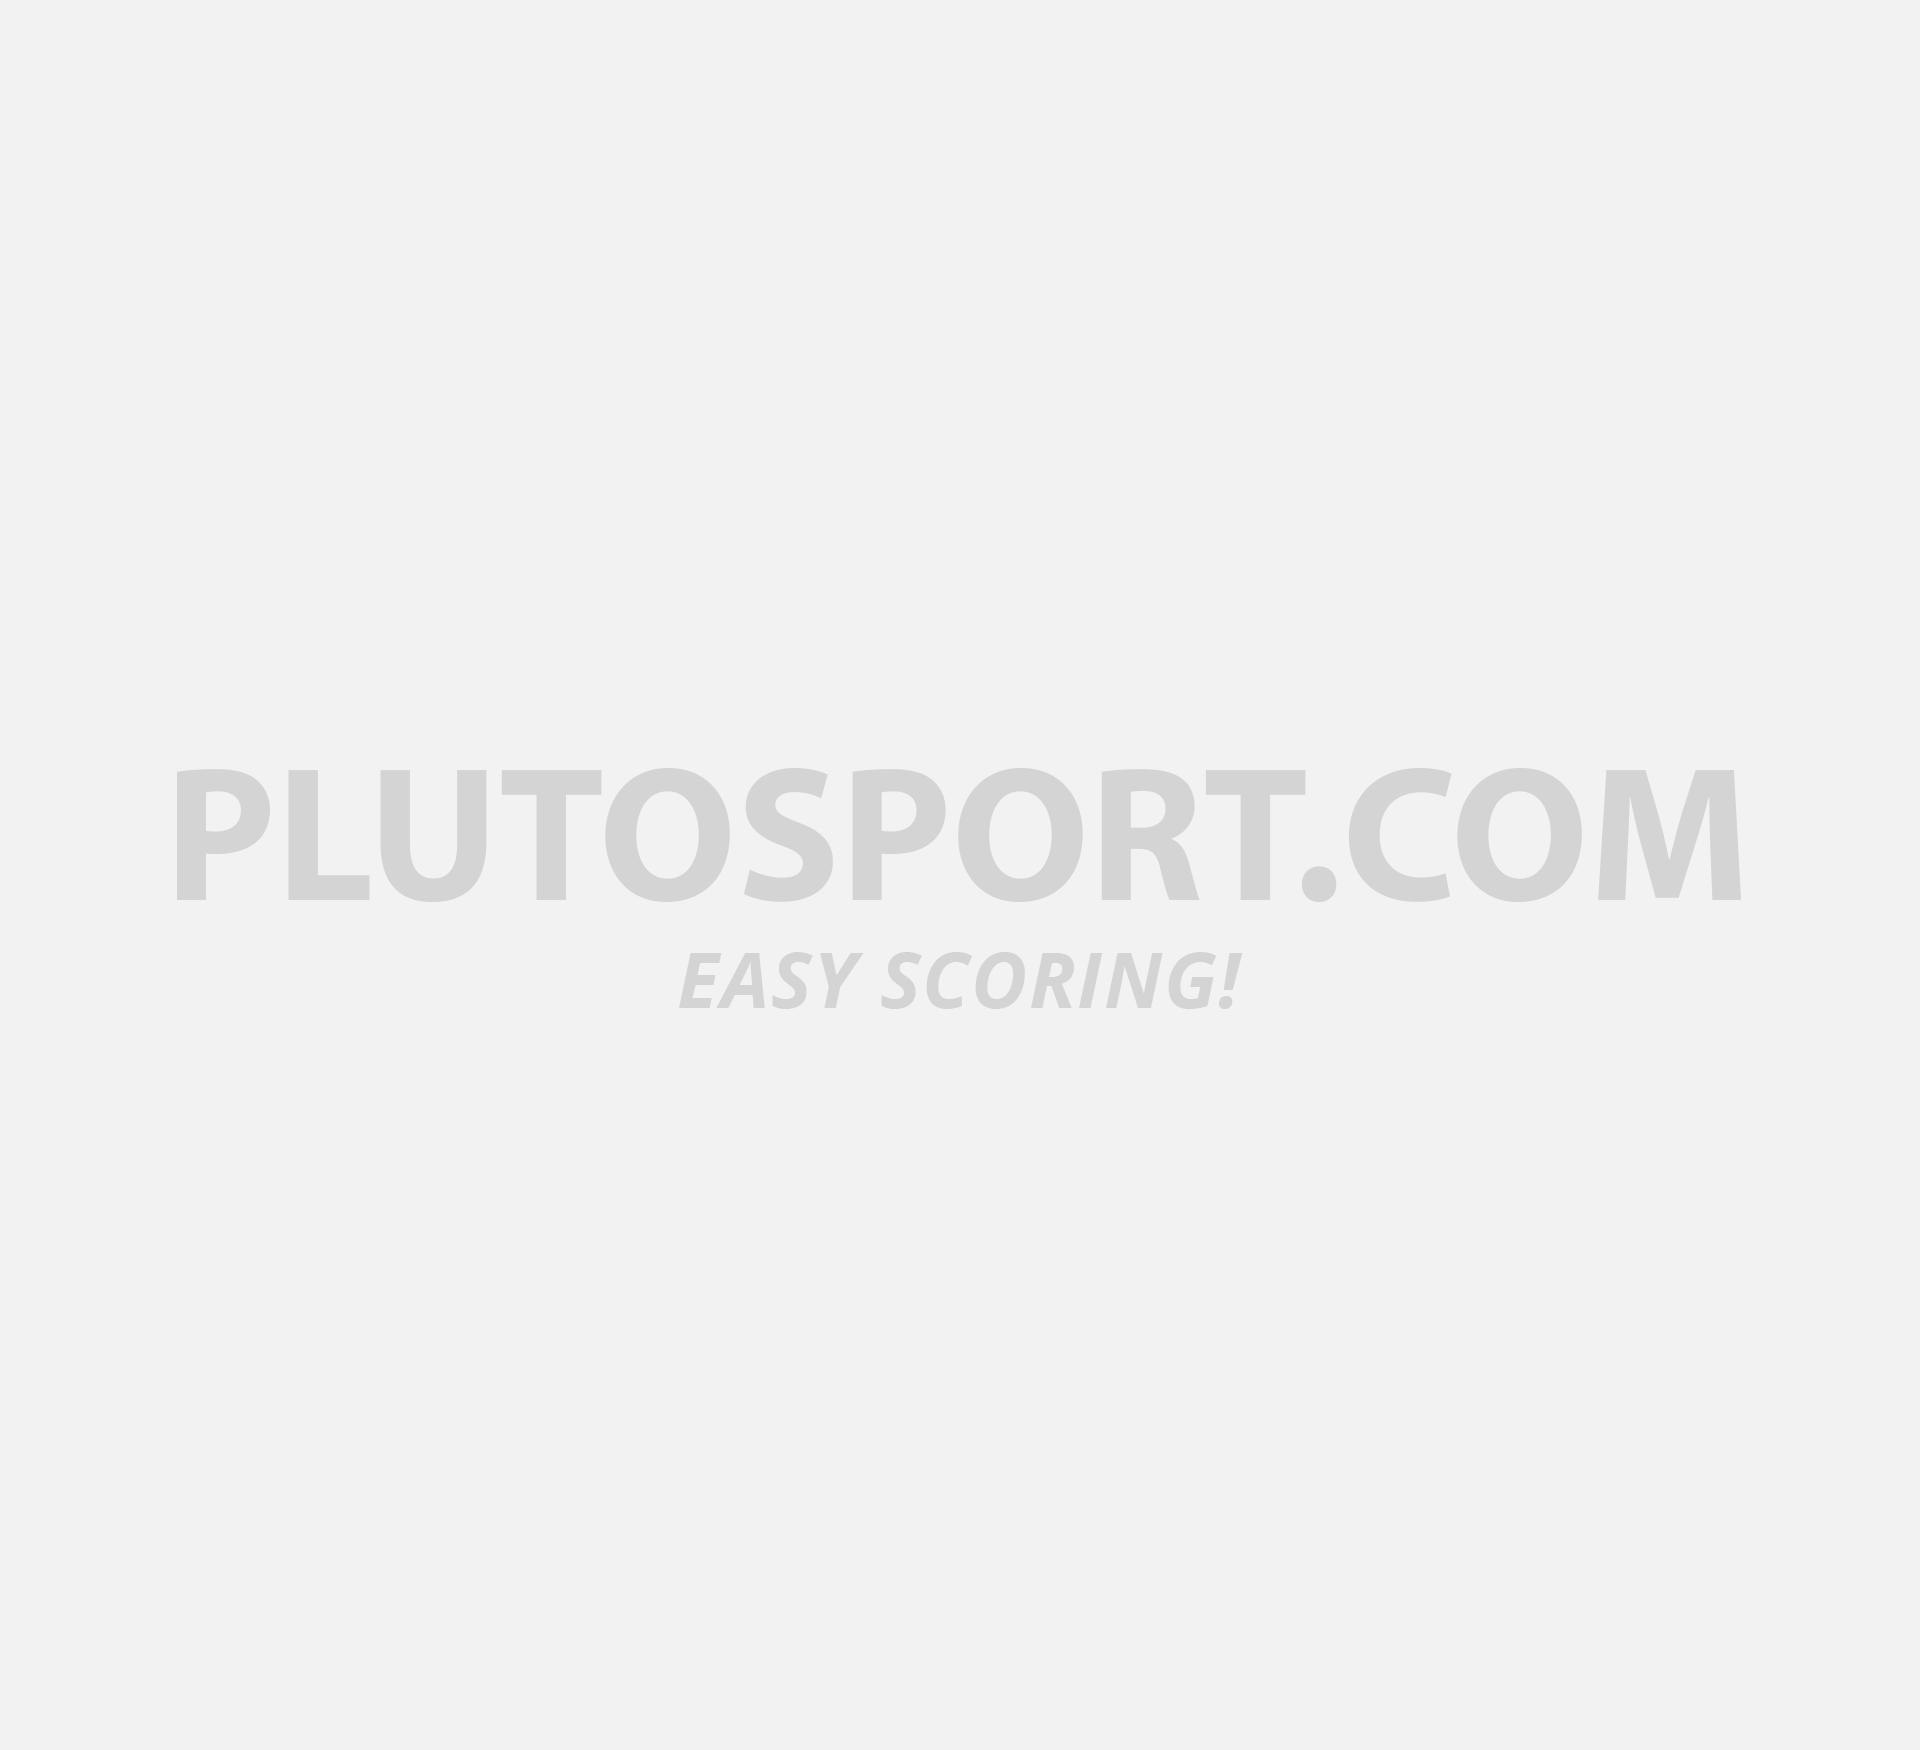 f34180f002d0 Puma Minestripe Slash Mini Shorts (2-pack) Womens - Underwear - Clothing -  Lifestyle - Sports | Plutosport